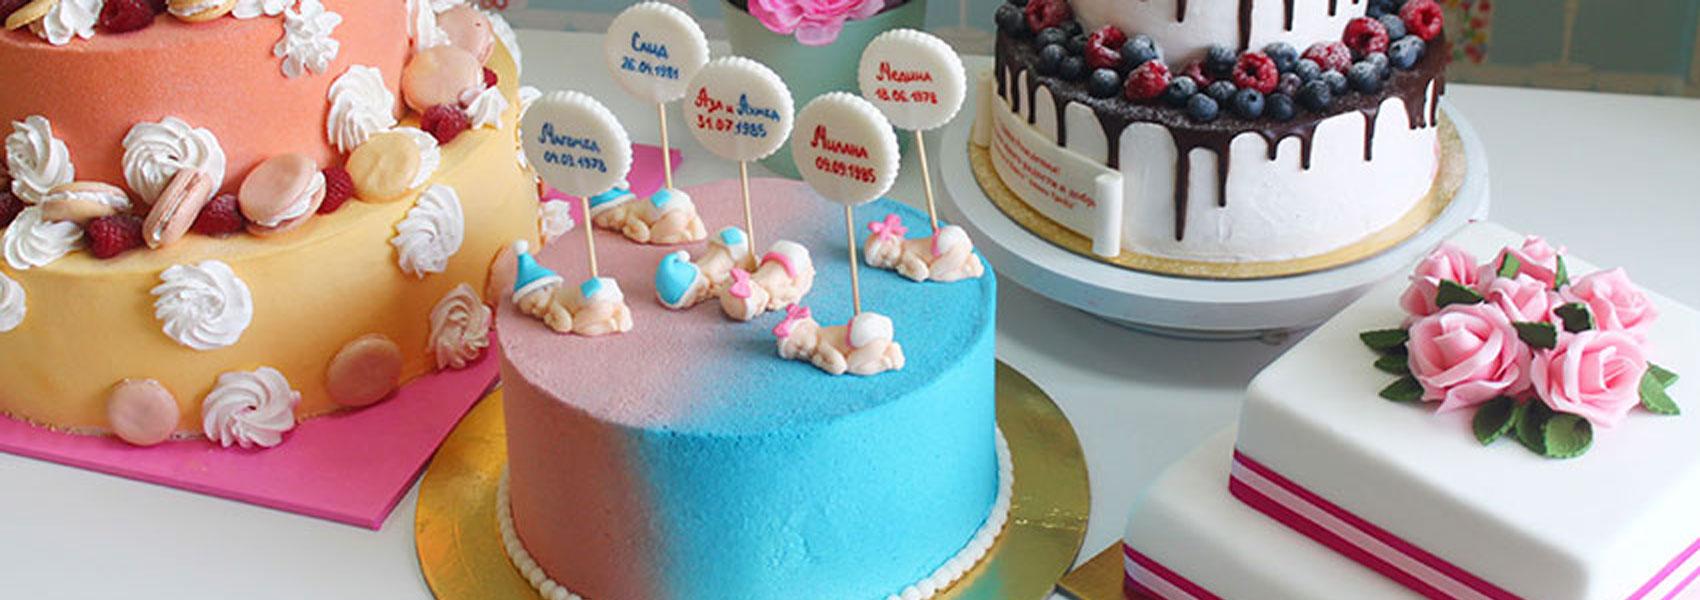 фото торта